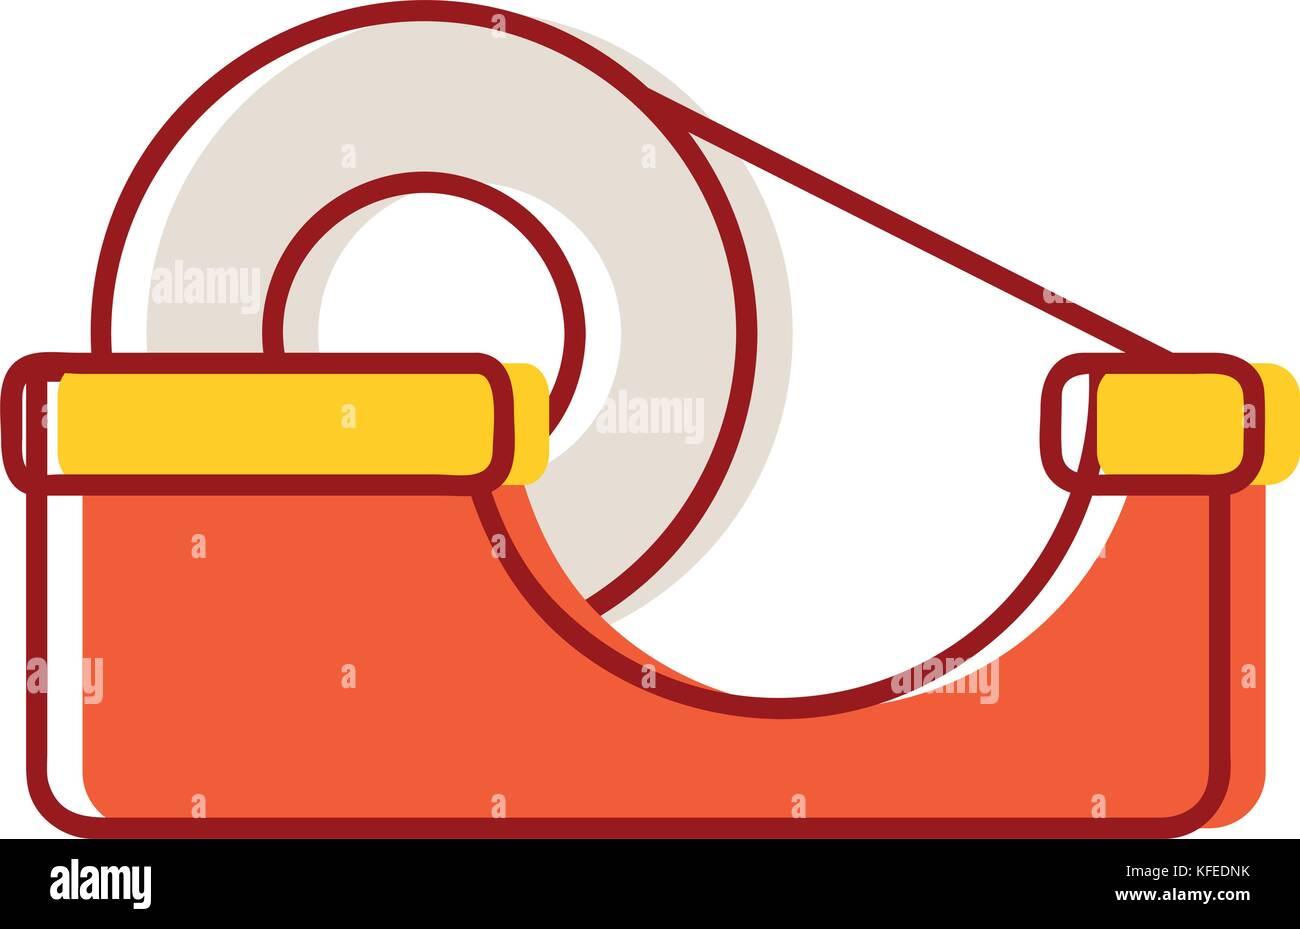 transparent adhesive tape object design - Stock Image